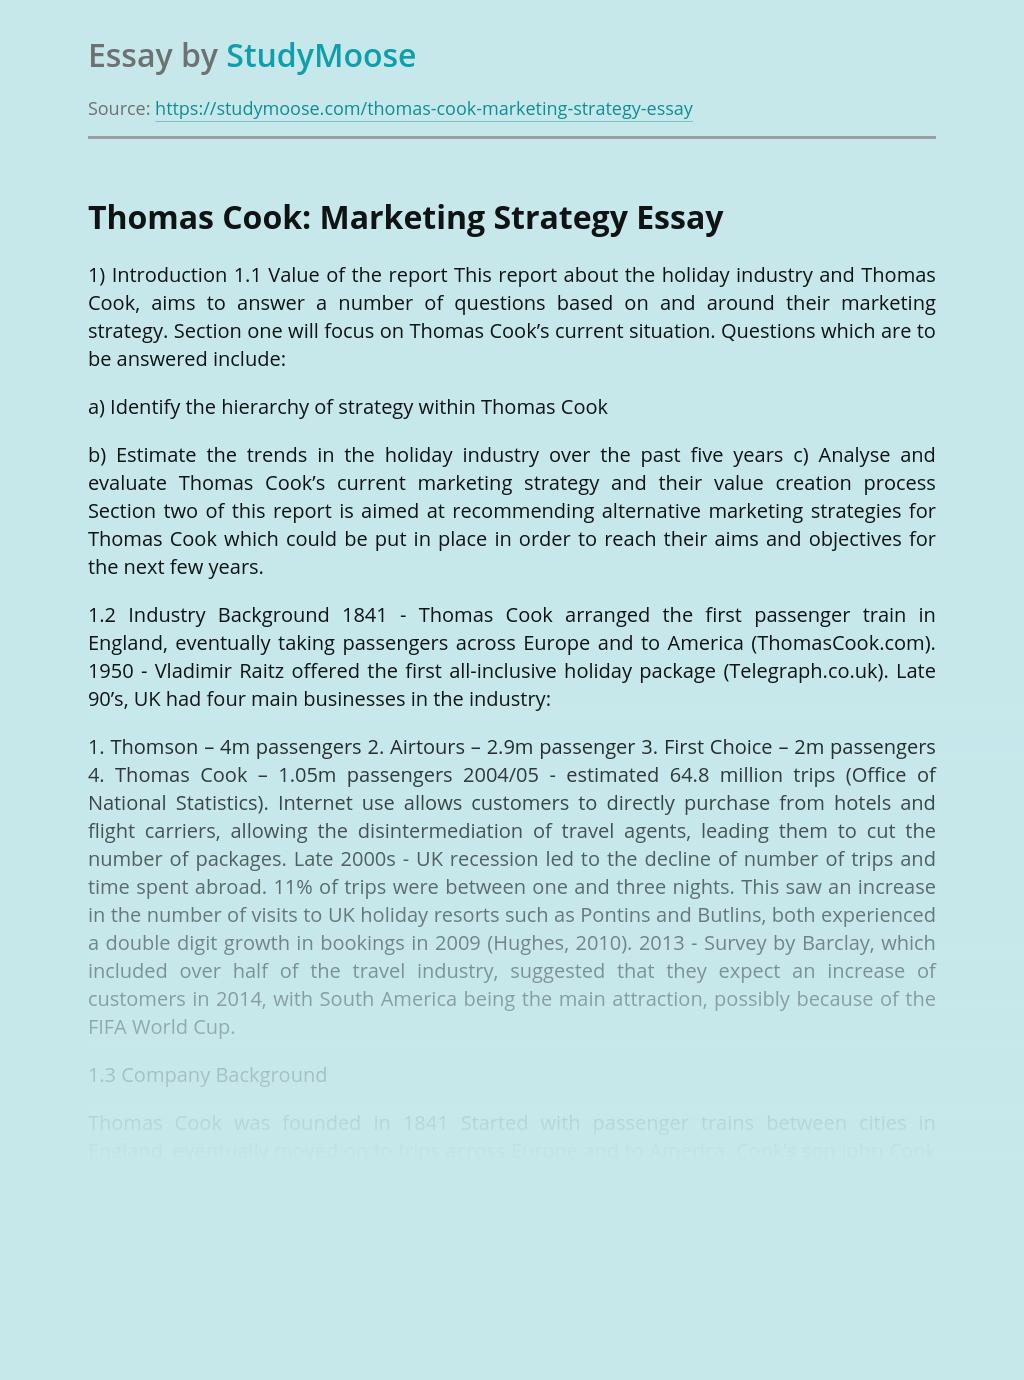 Thomas Cook: Marketing Strategy